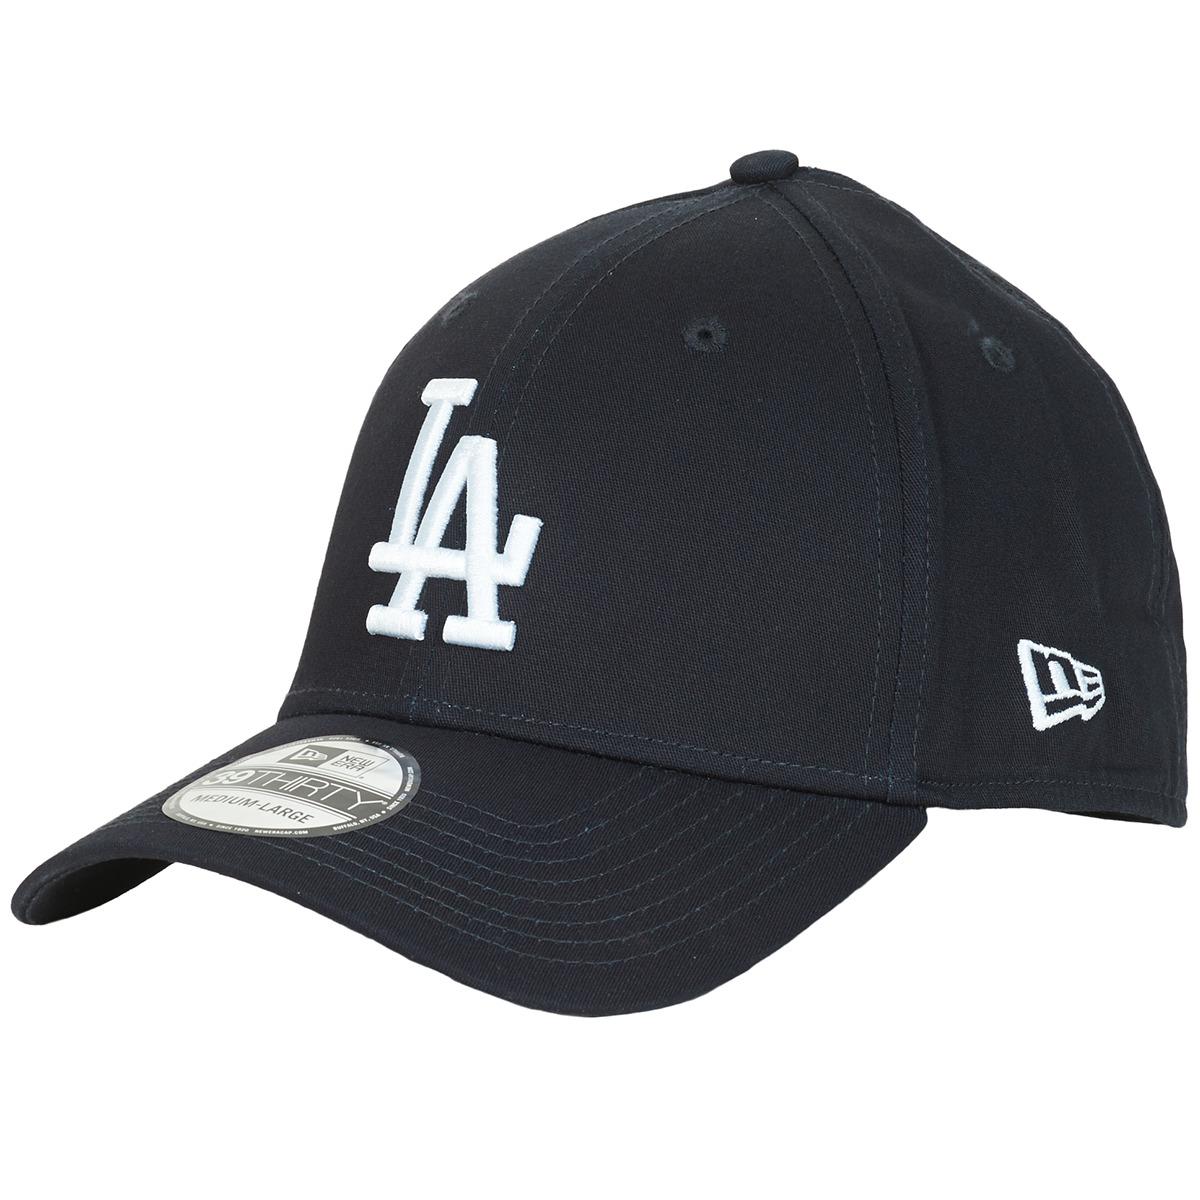 Kasketter New-Era  LEAGUE BASIC 39THIRTY LOS ANGELES DODGERS